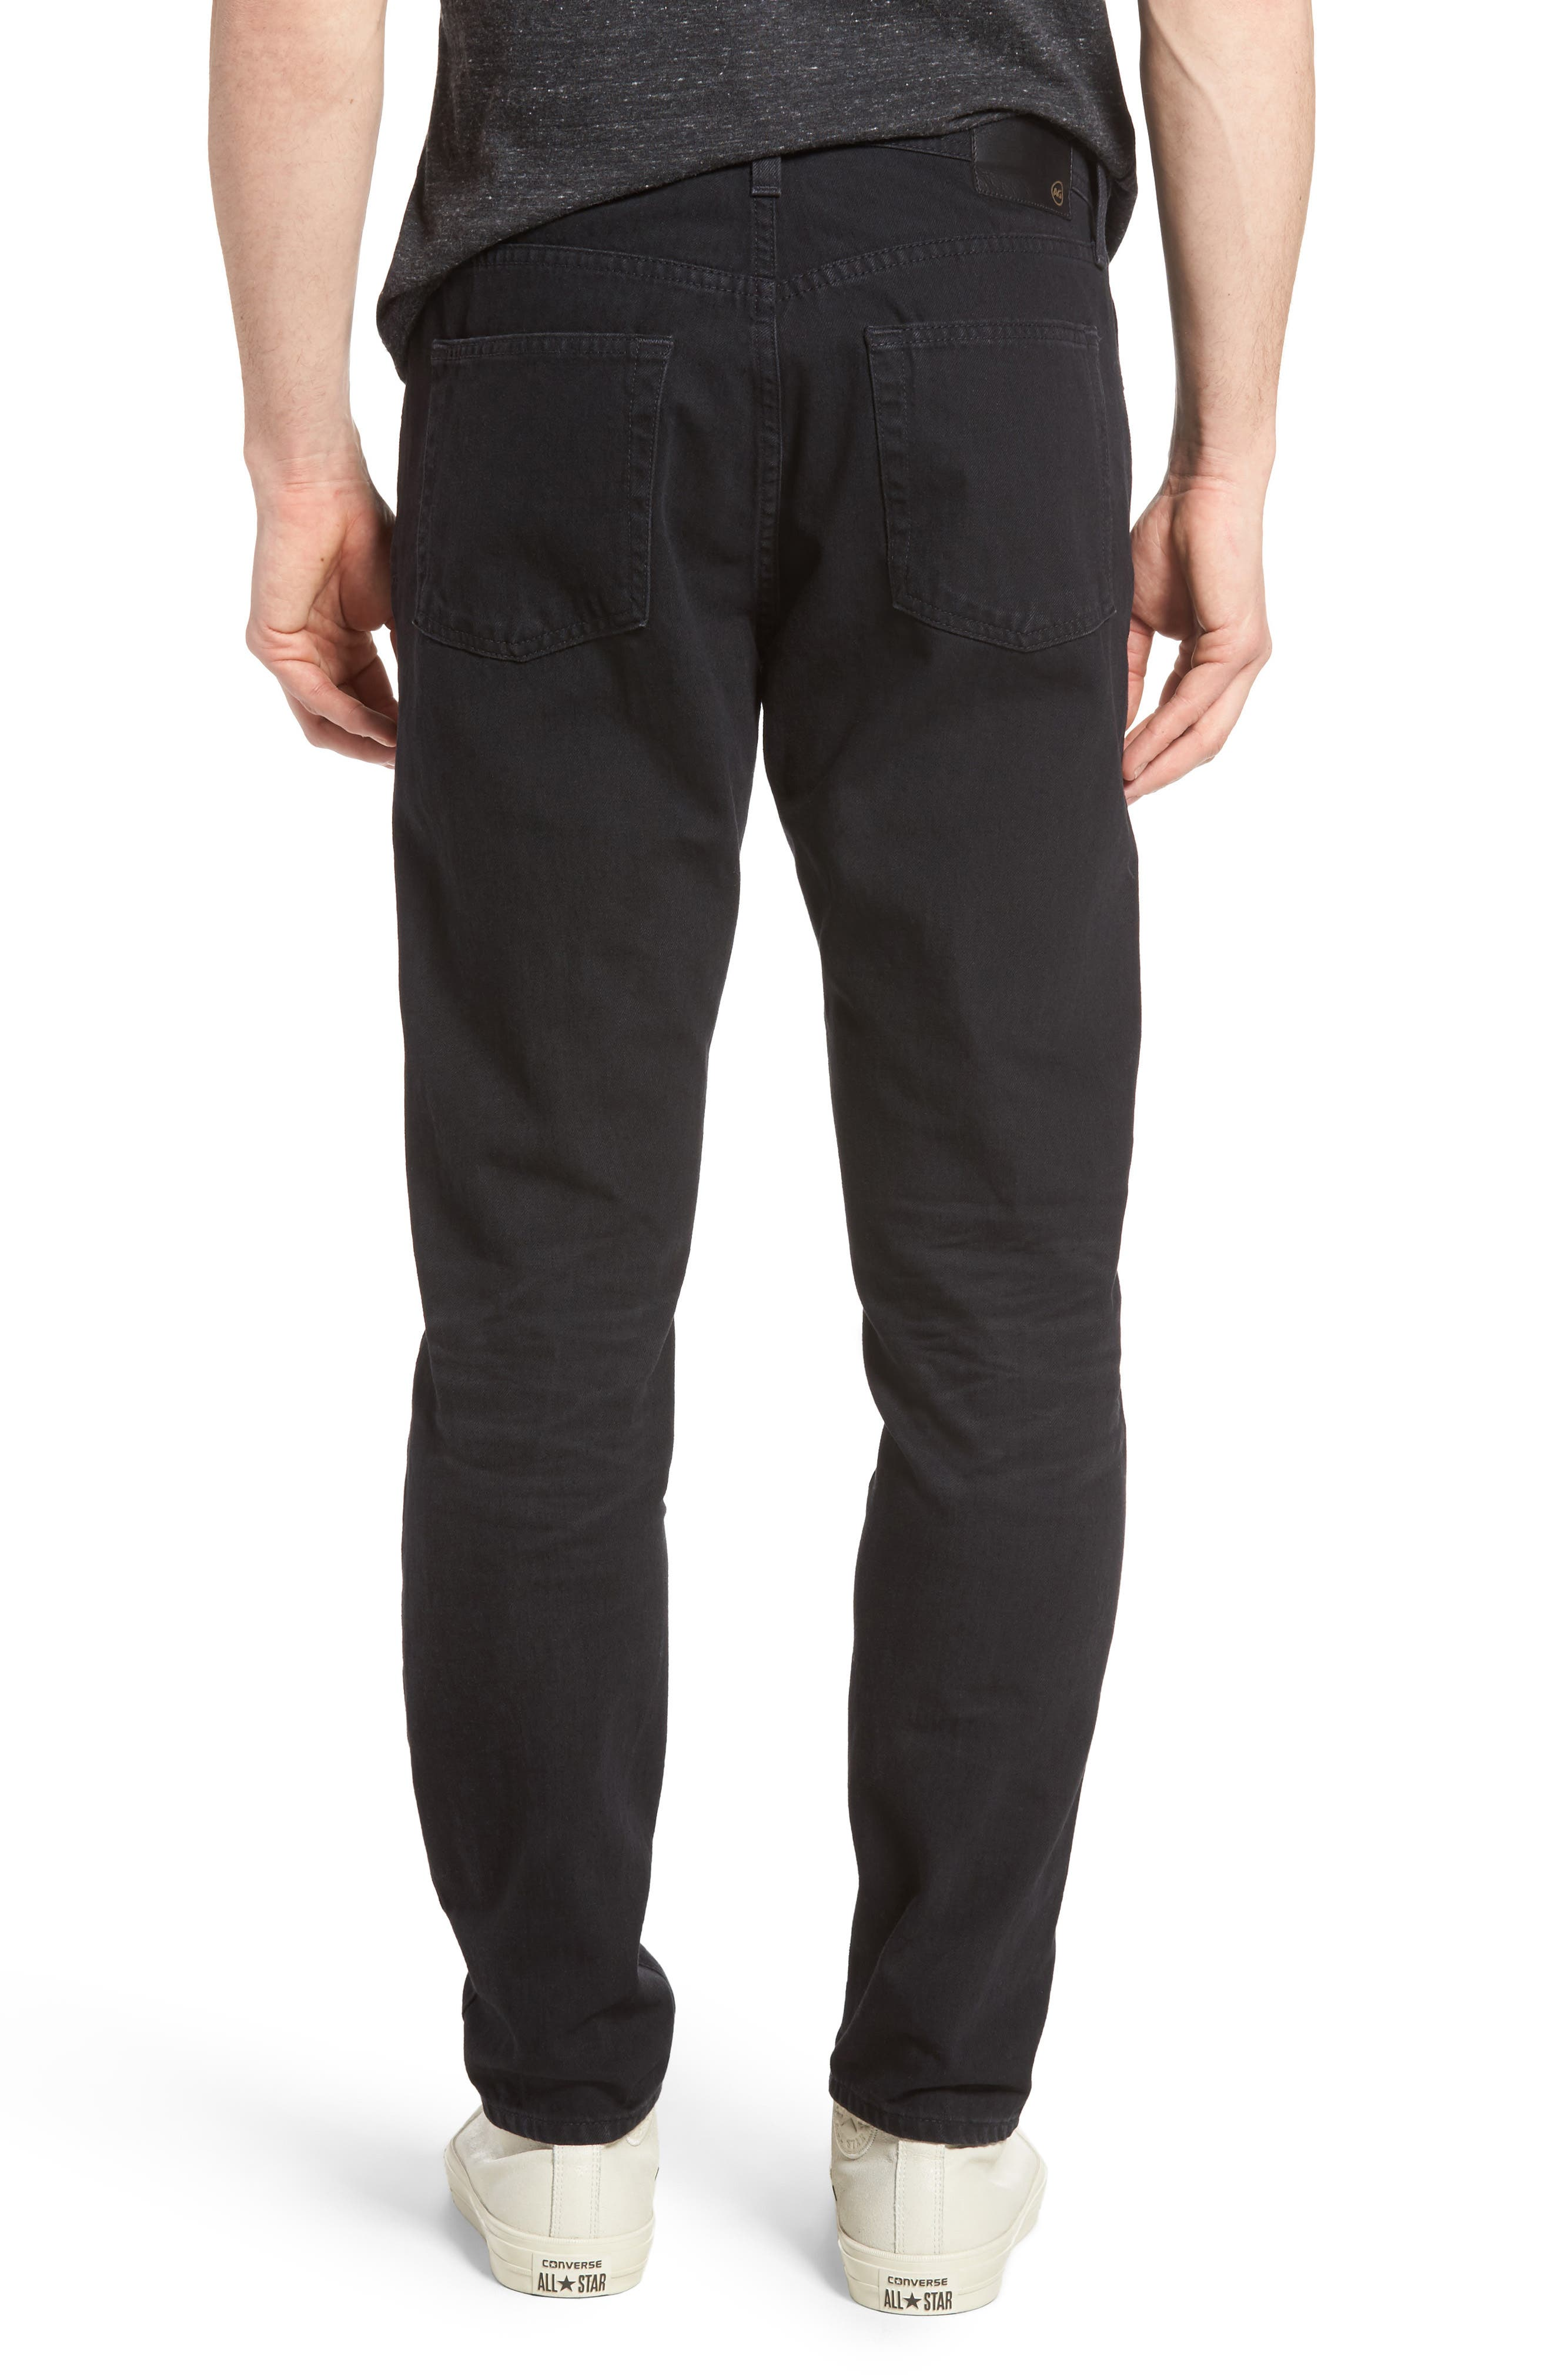 Apex Slouchy Slim Fit Jeans,                             Alternate thumbnail 2, color,